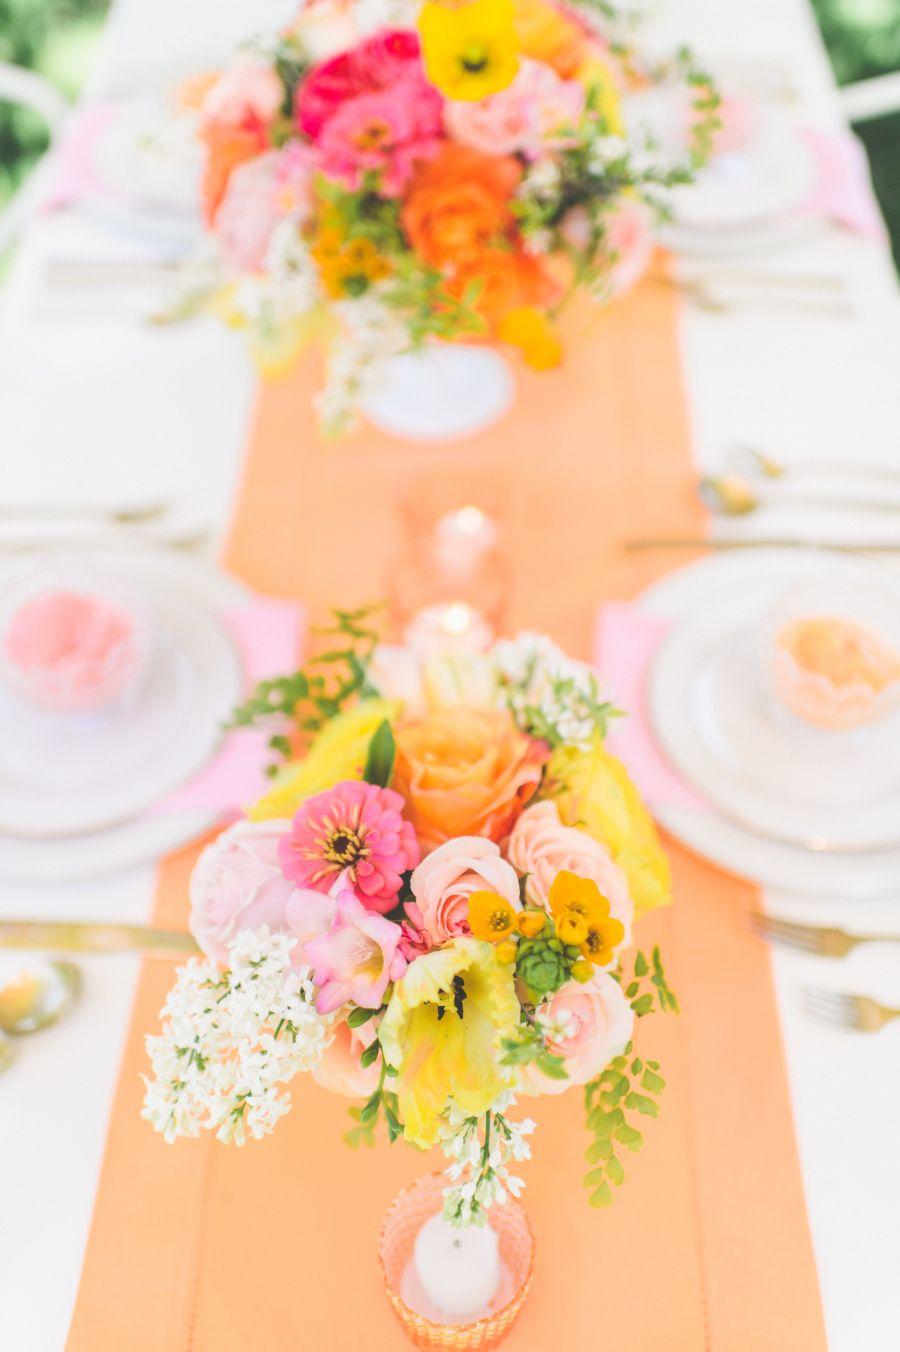 Photography: Paper Antler - paperantler.com Floral Design: Studio Fleurette - studiofleurette.com Wedding Venue: Seven Oaks Farm - www.sevenoaksfarm.info   Read More on SMP: http://www.stylemepretty.com/2014/08/11/bright-love-in-bloom-wedding-inspiration/